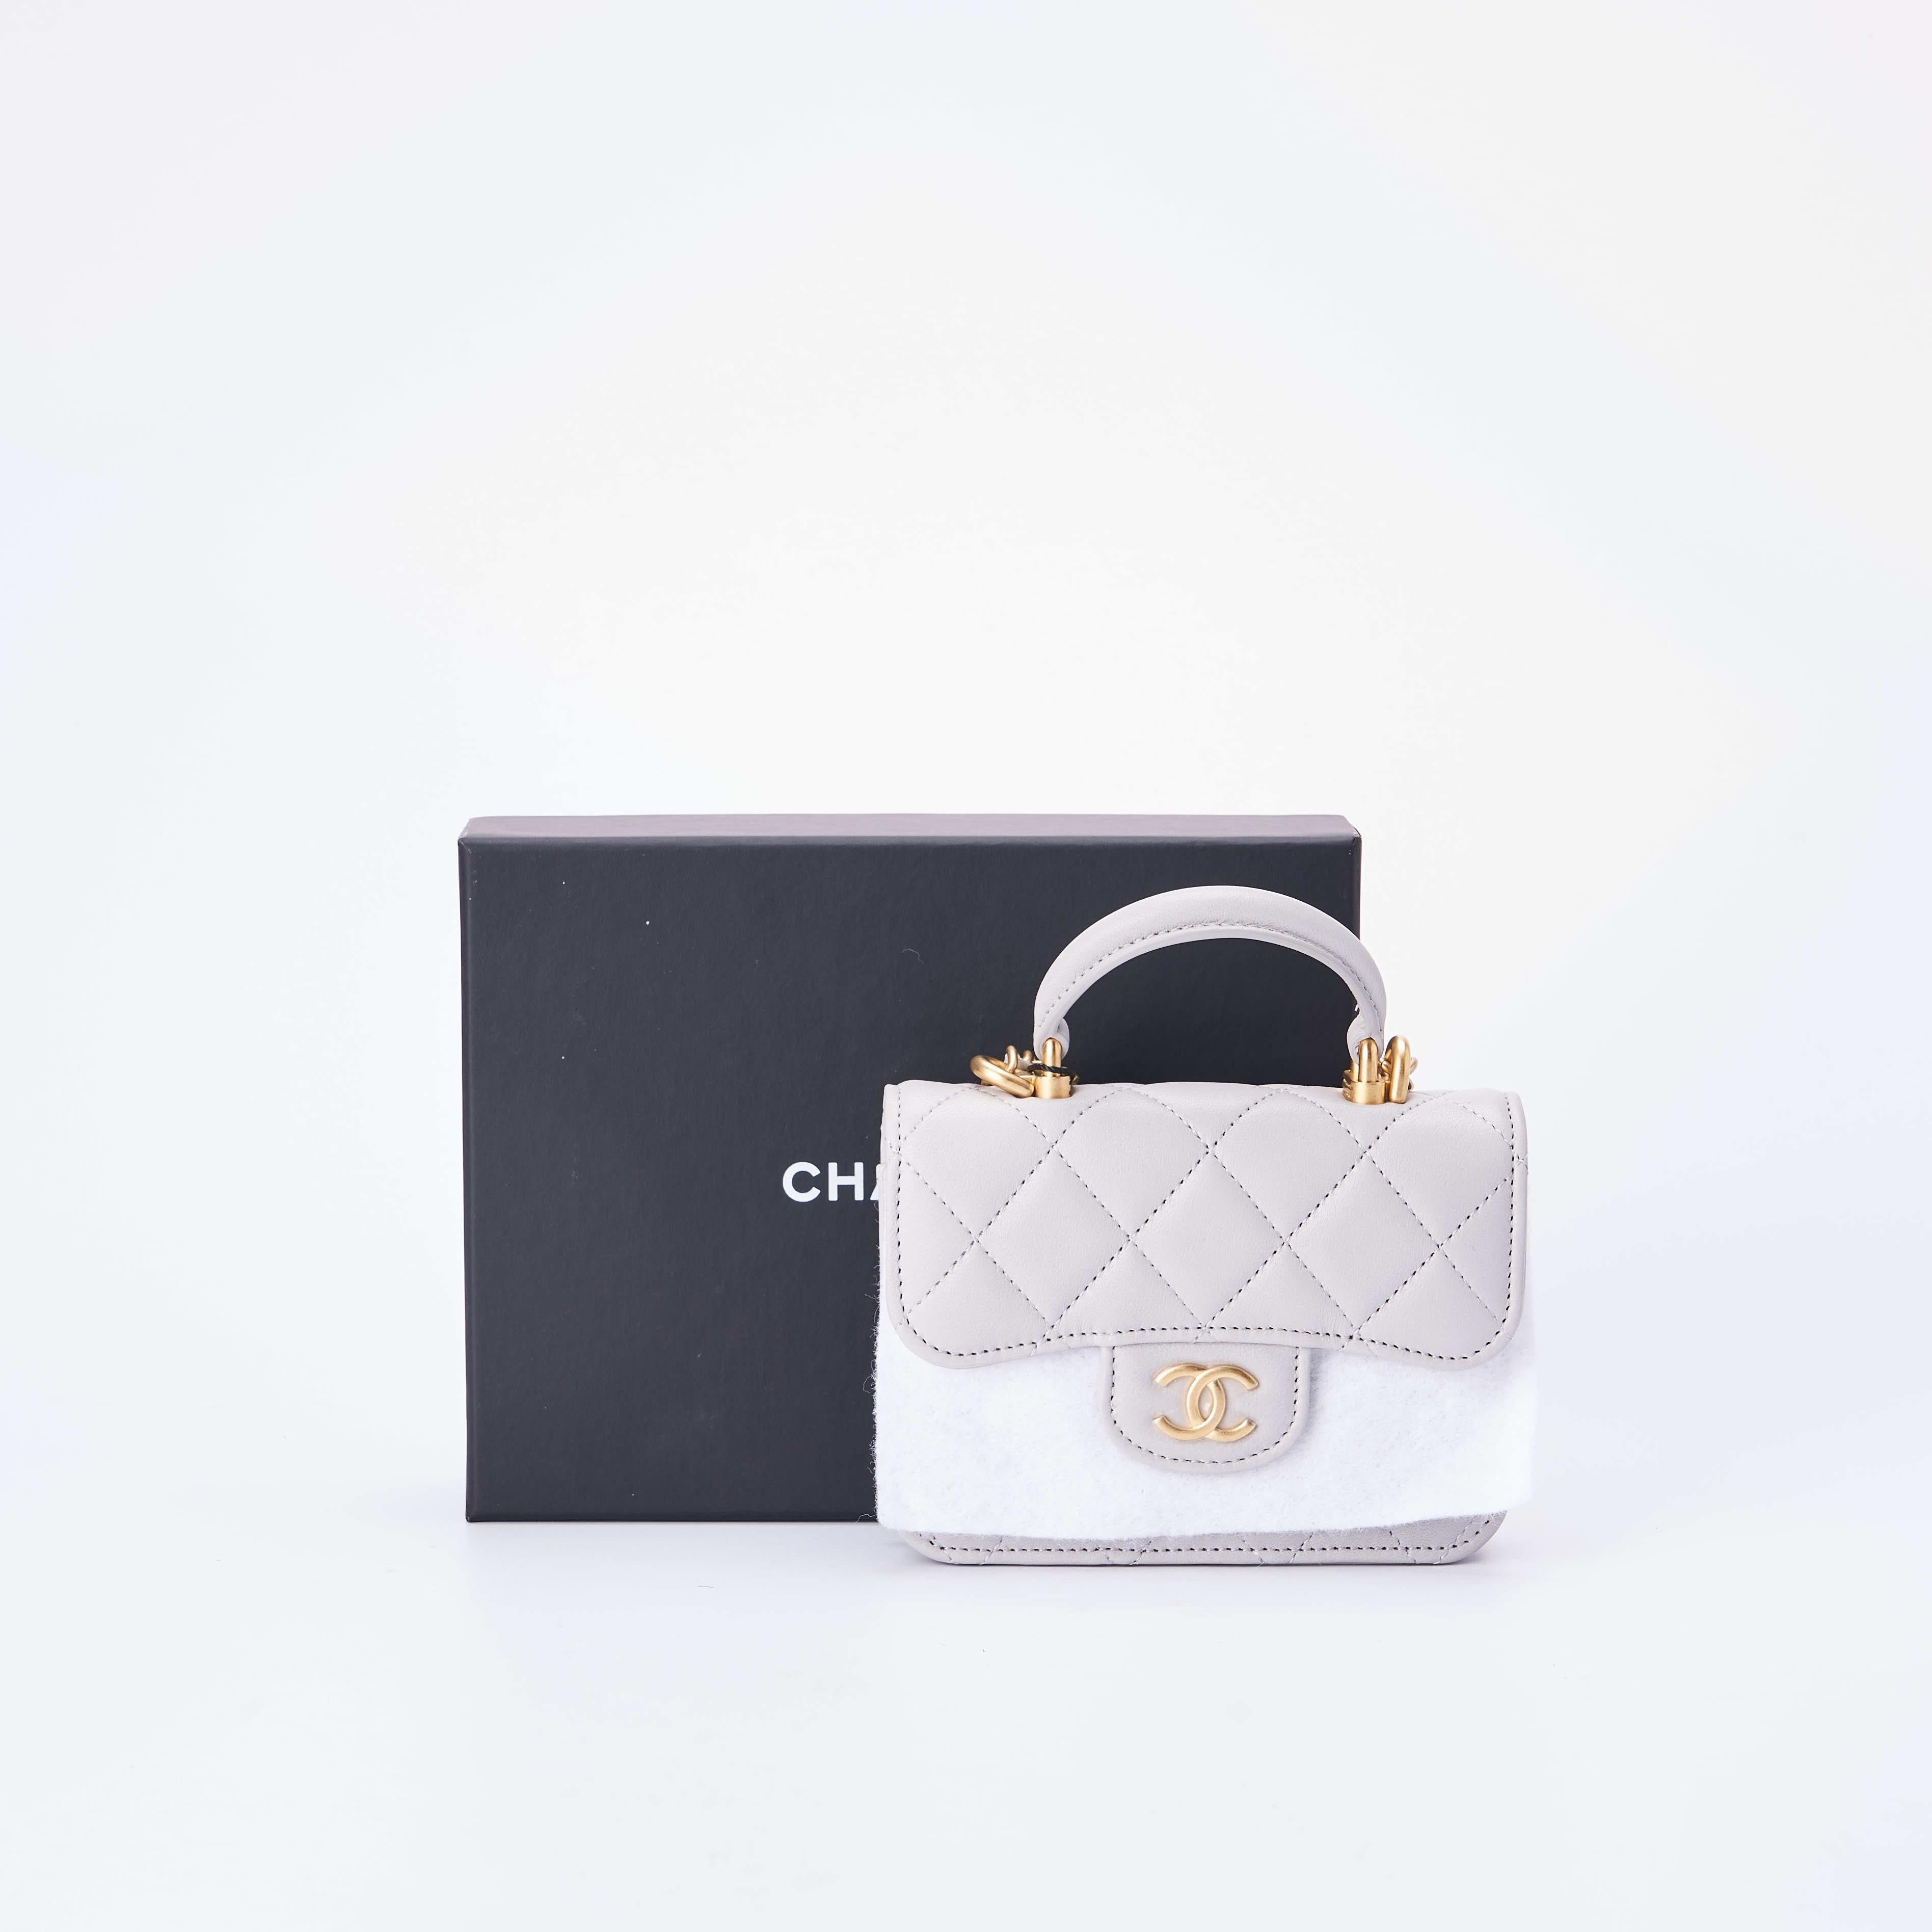 chanel链条包 临时【准新】Chanel香奈儿 手柄口盖链条包 12*9公价¥13000_推荐淘宝好看的chanel链条包